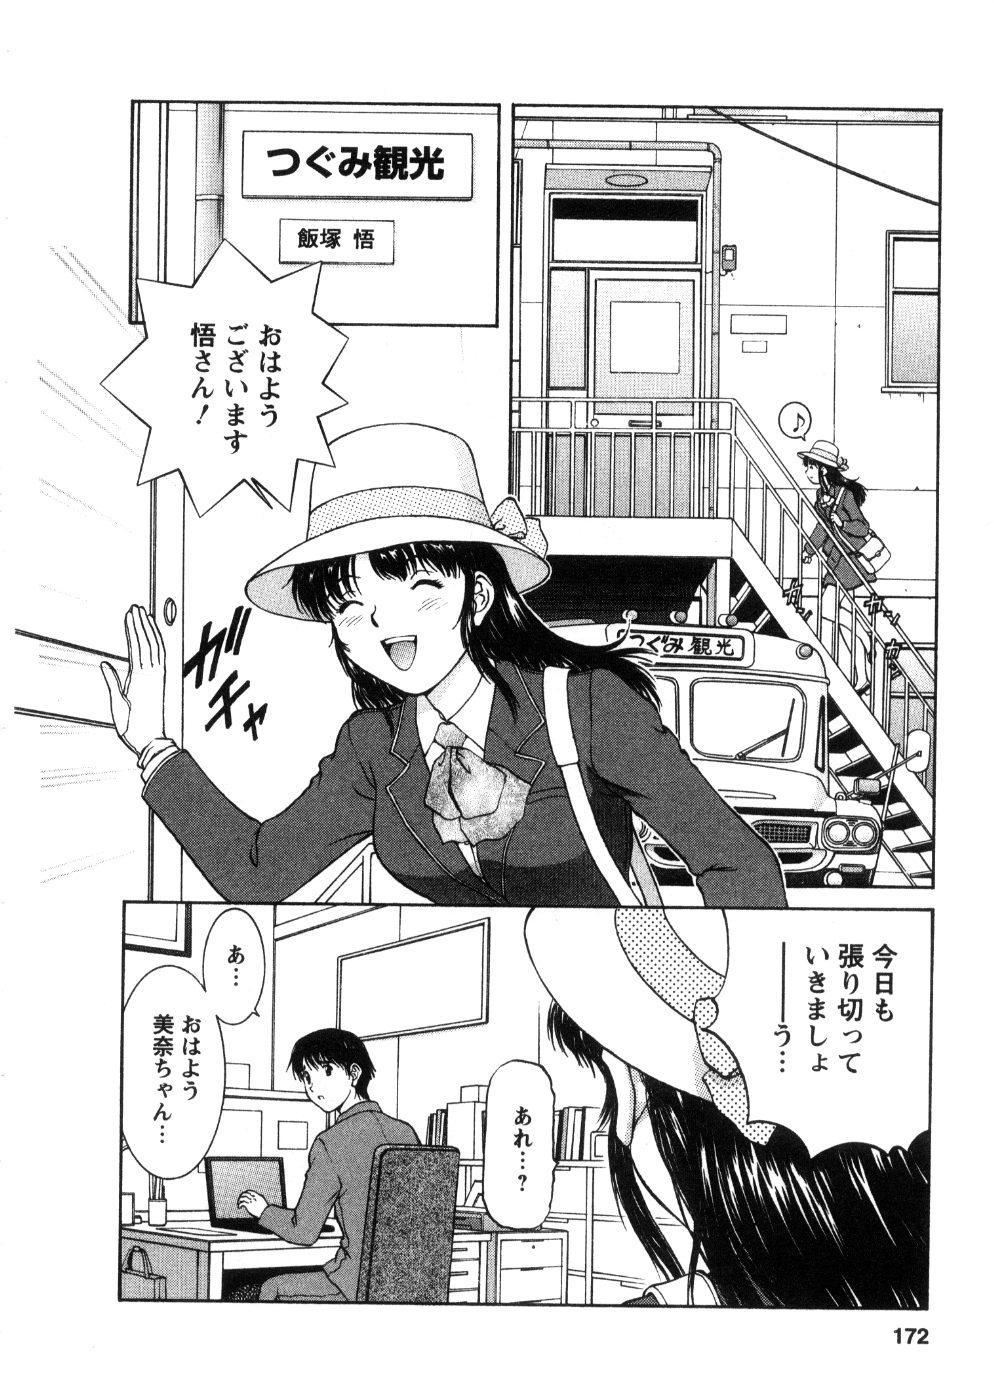 Oneechan-tachi ga Yatte Kuru 03 173